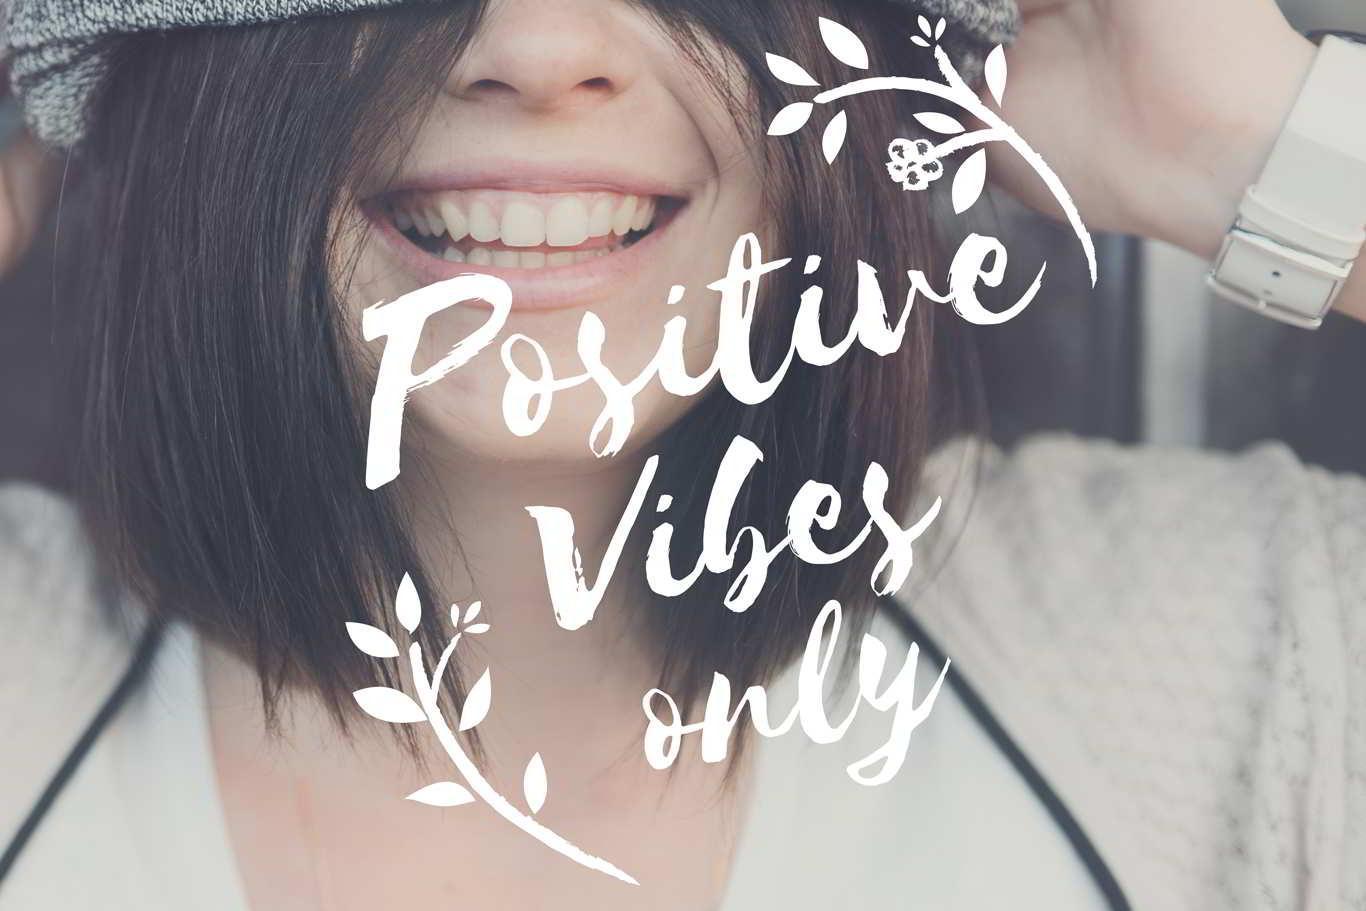 Como ser positivo diante dos problemas?